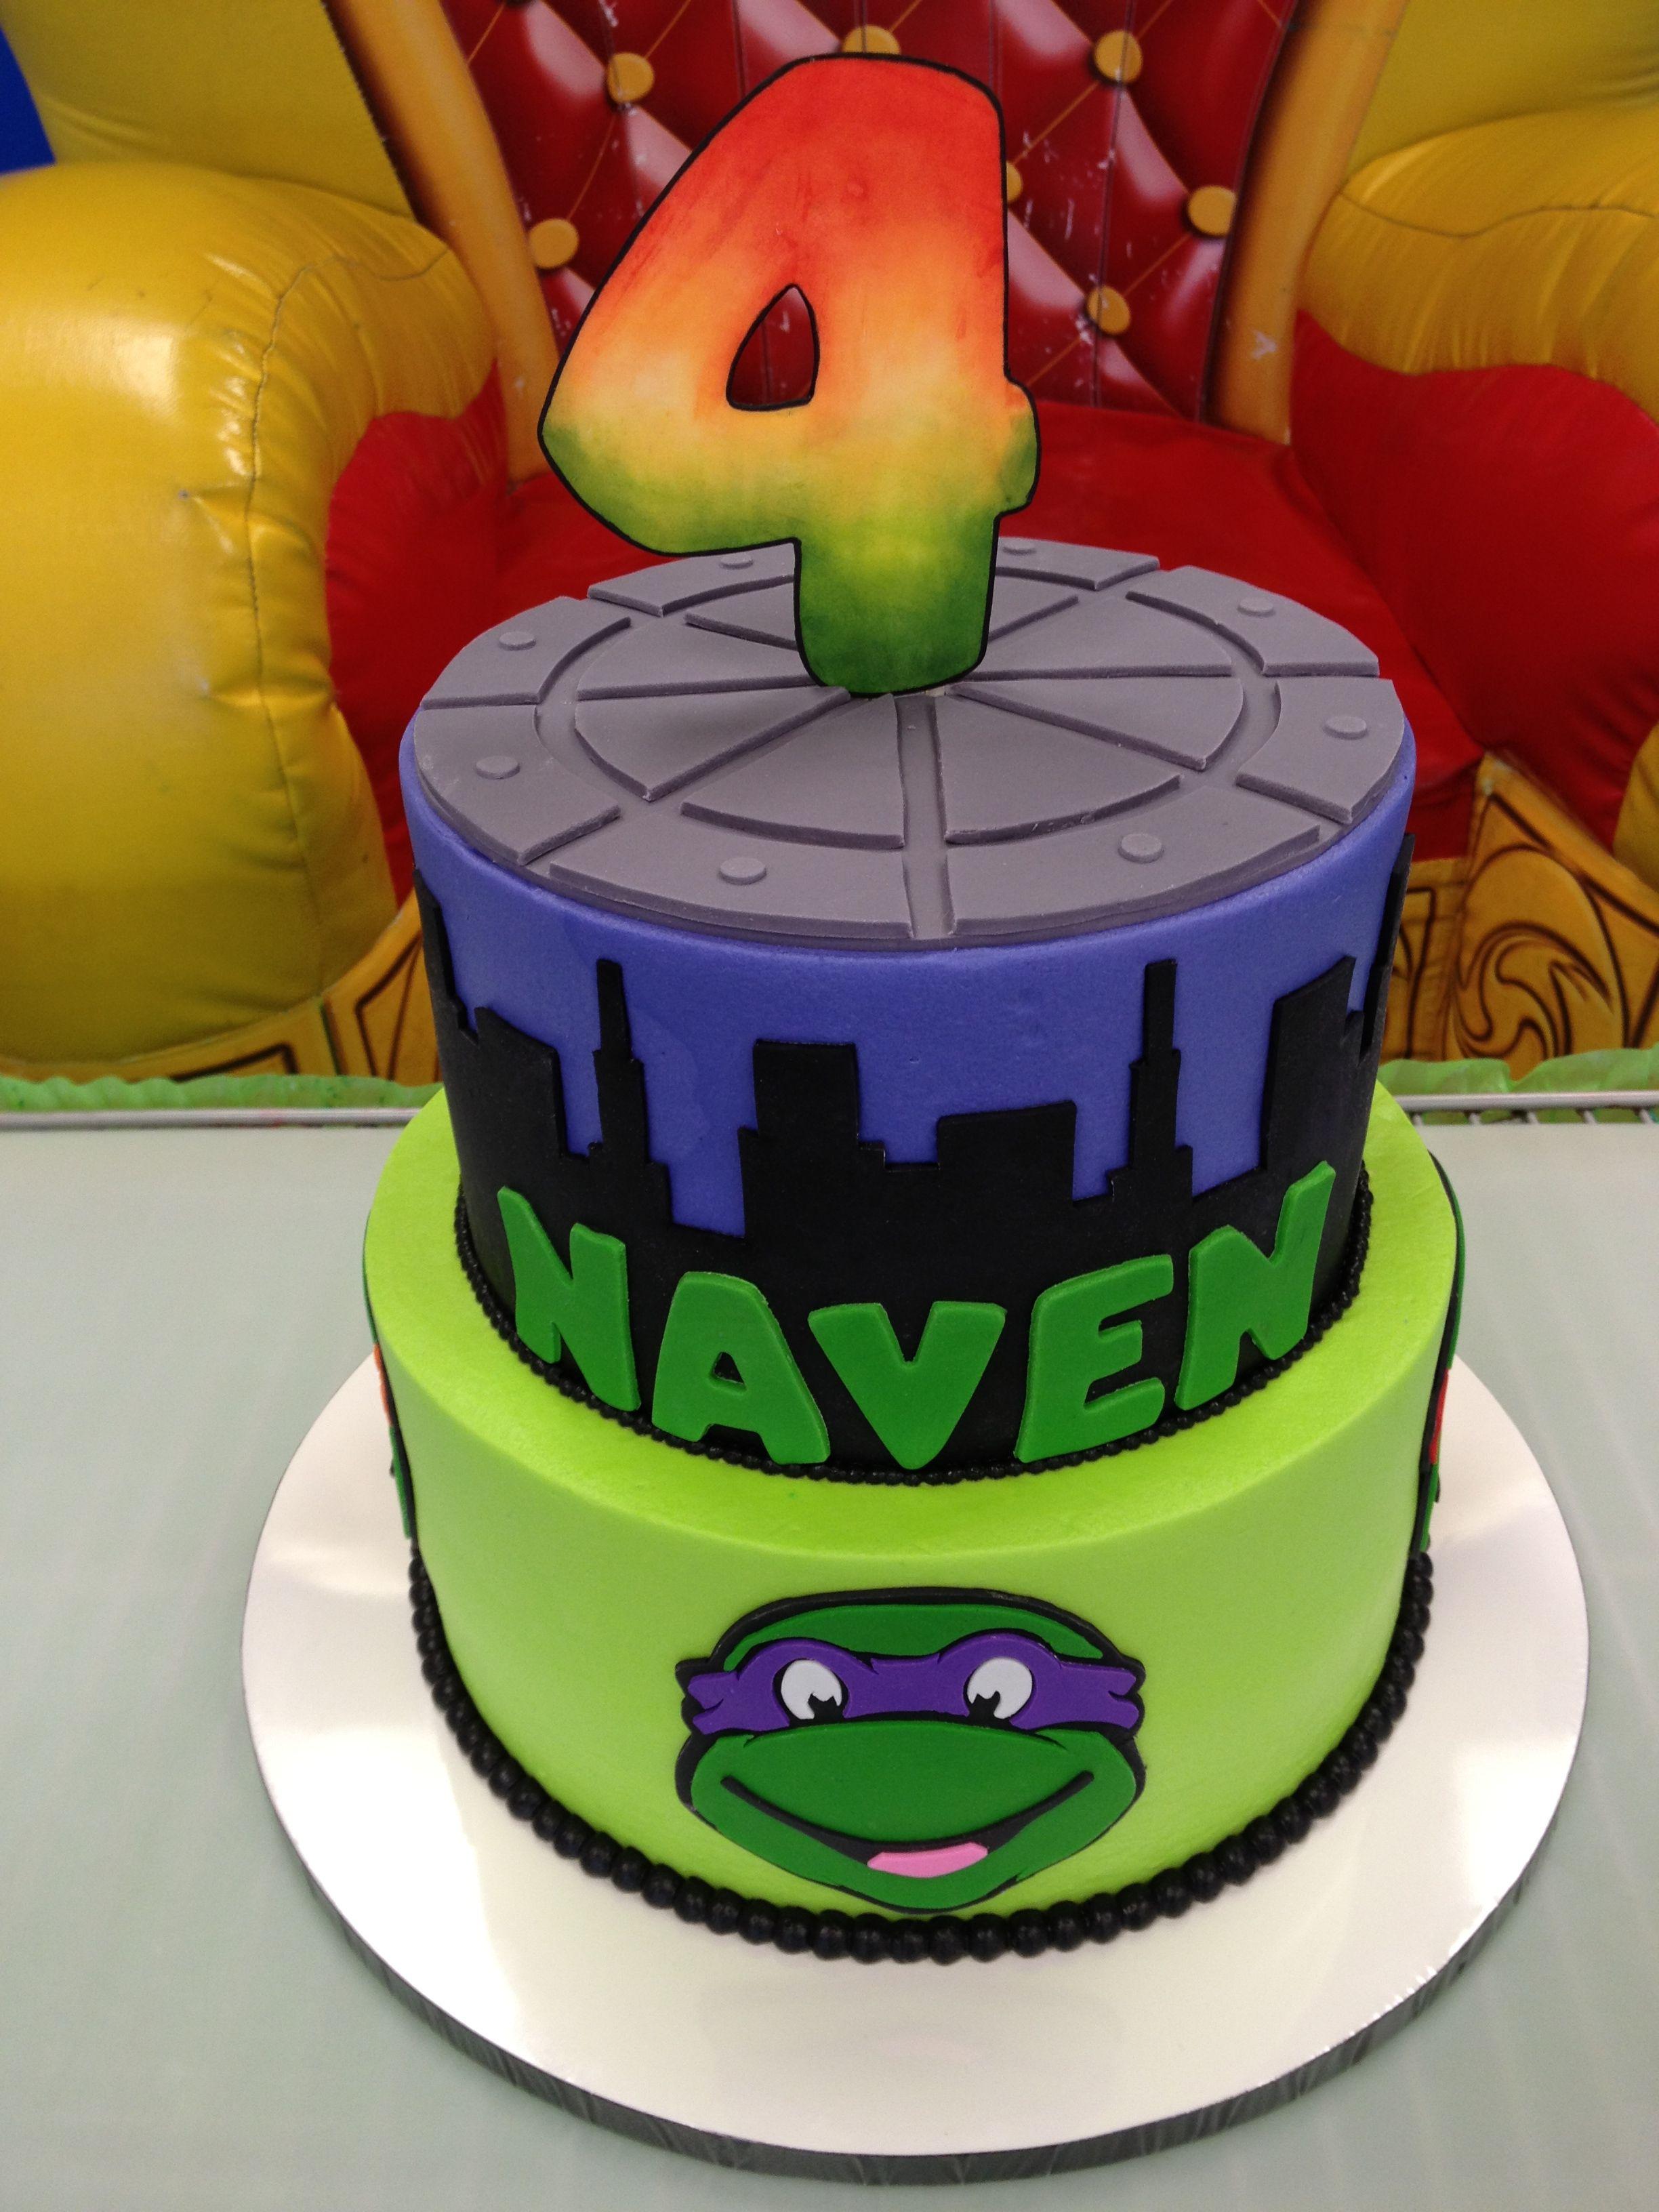 Pin By Amber O On Birthday Cake Ideas Ninja Turtle Birthday Cake Turtle Birthday Cake Cool Birthday Cakes